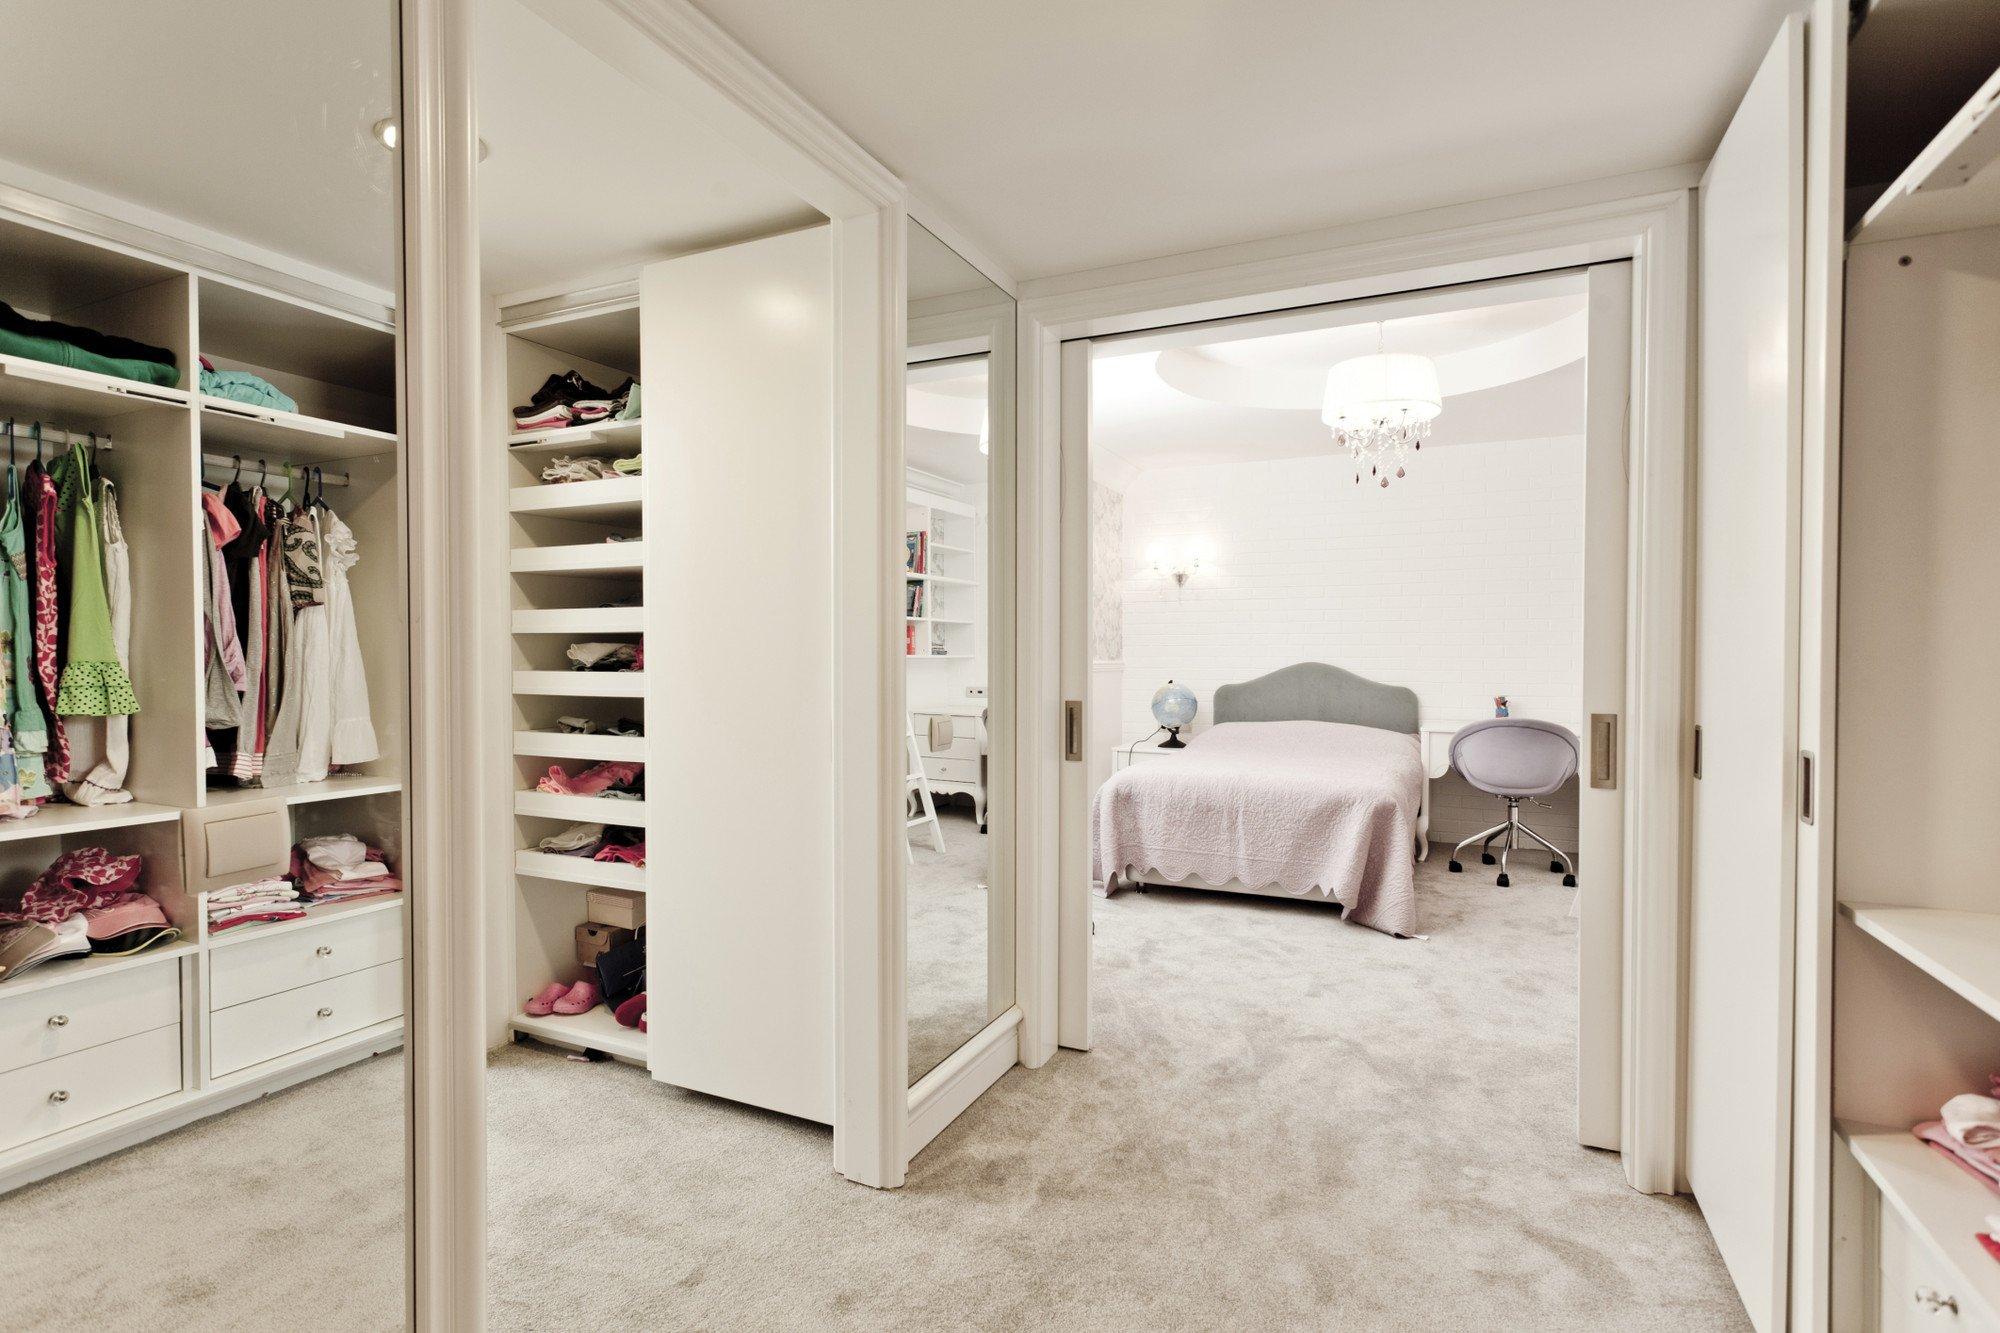 Mirrored wardrobe in house